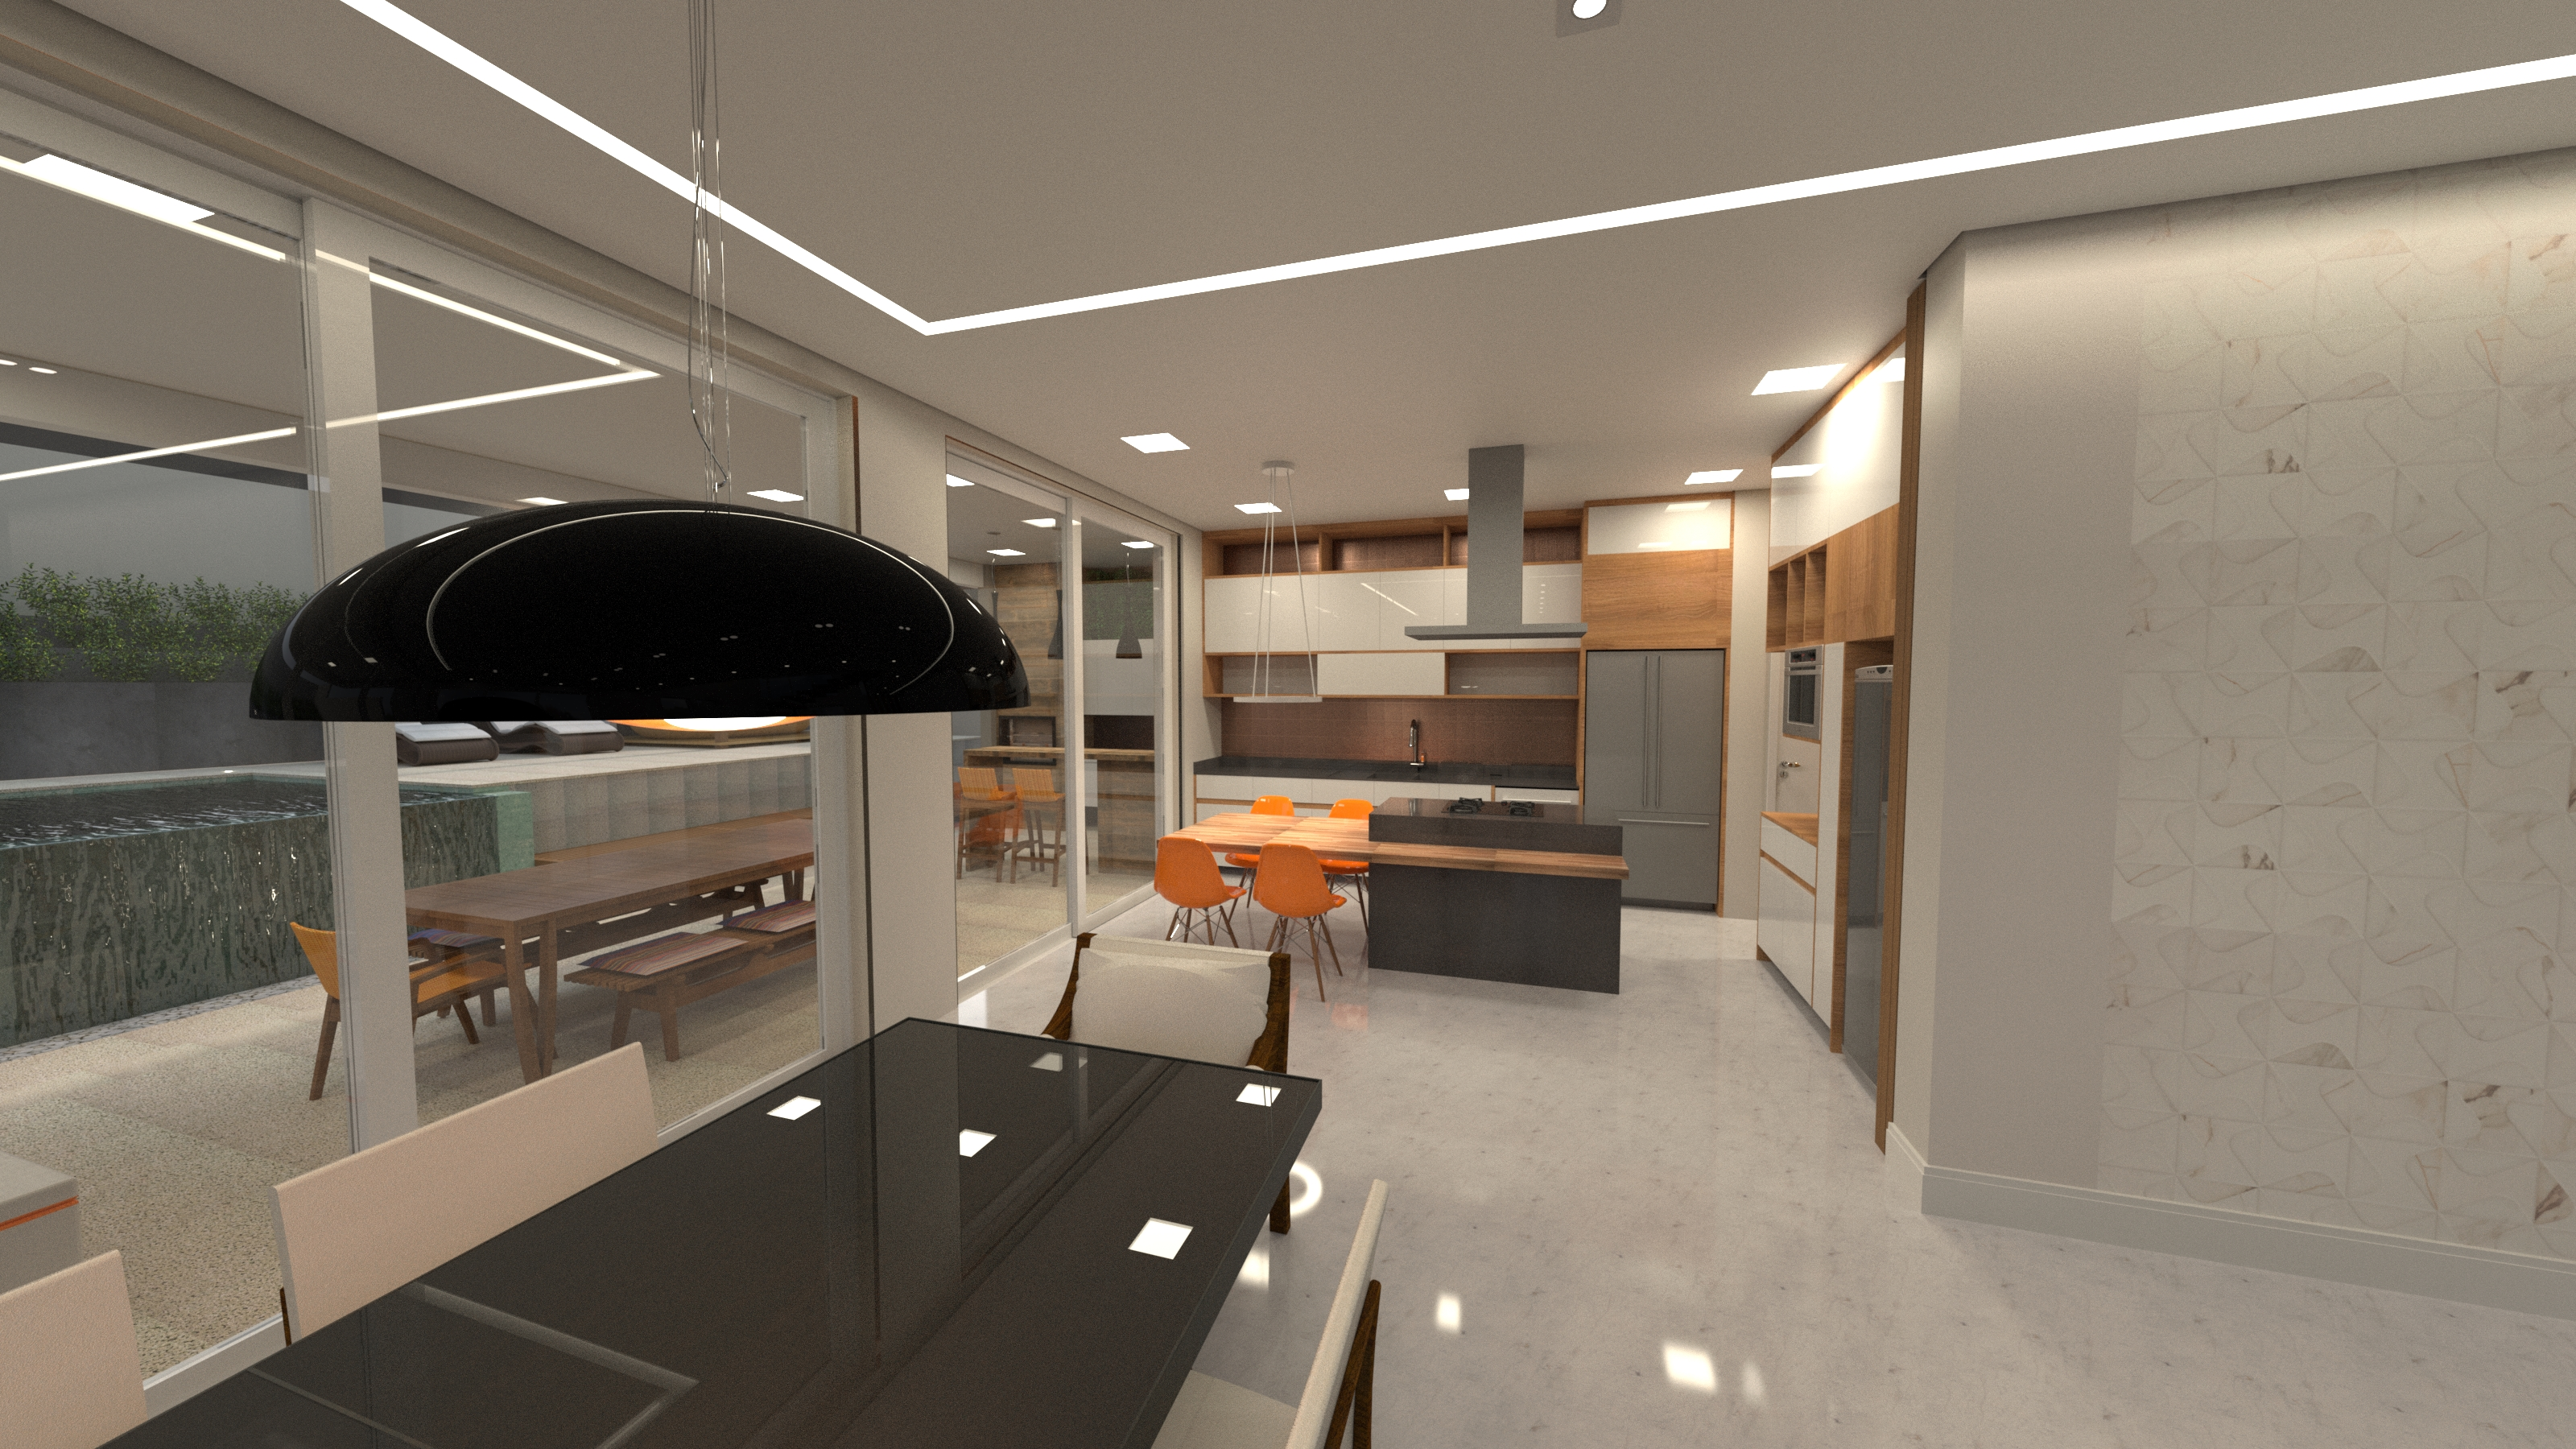 Cozinha   BURLEMARX.547